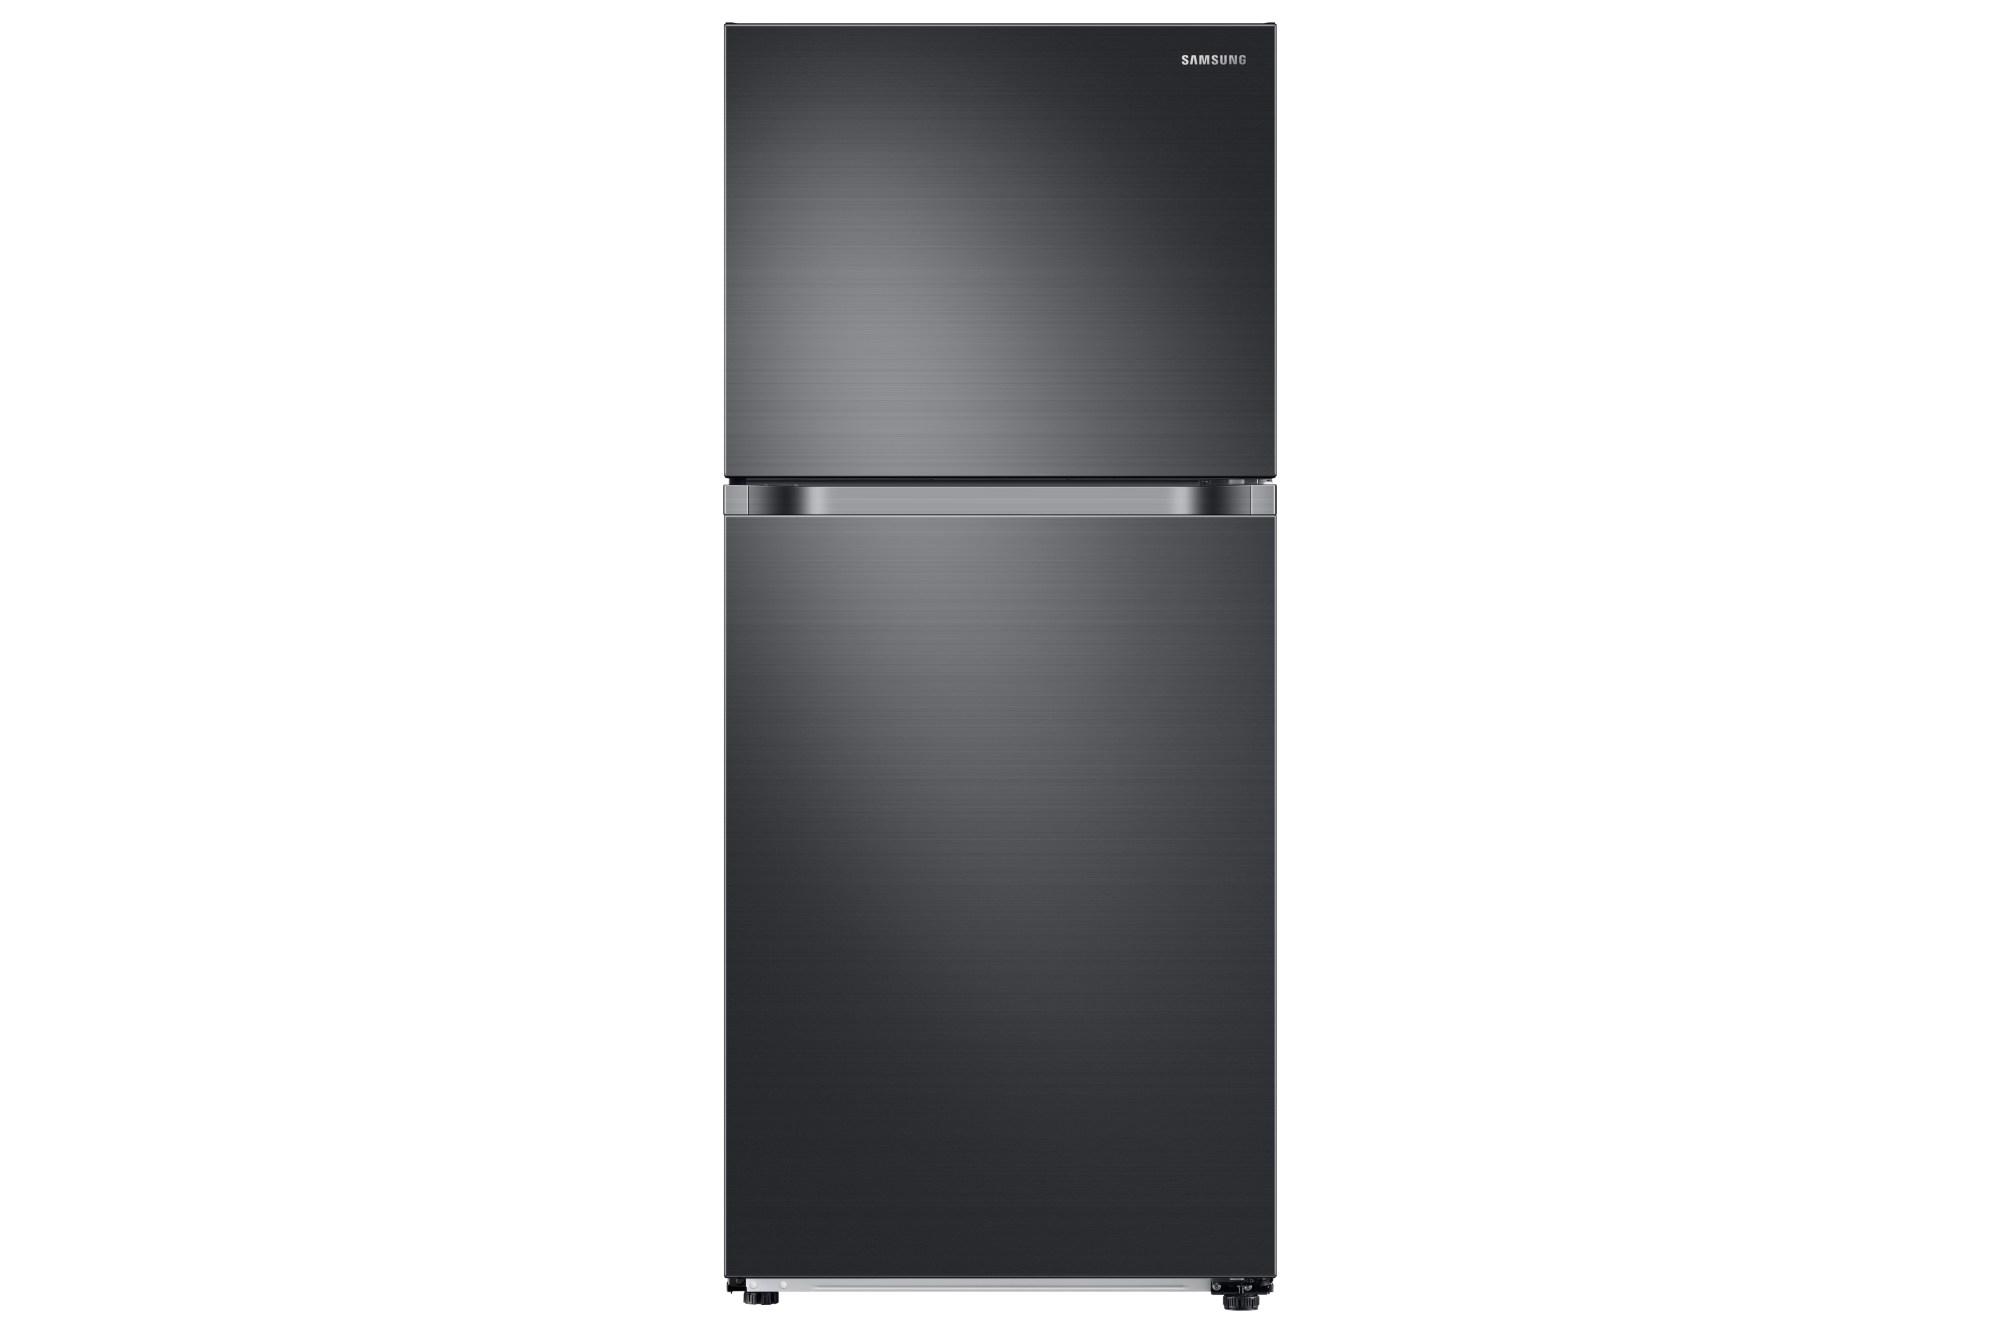 hight resolution of top freezer rt18m6215 series